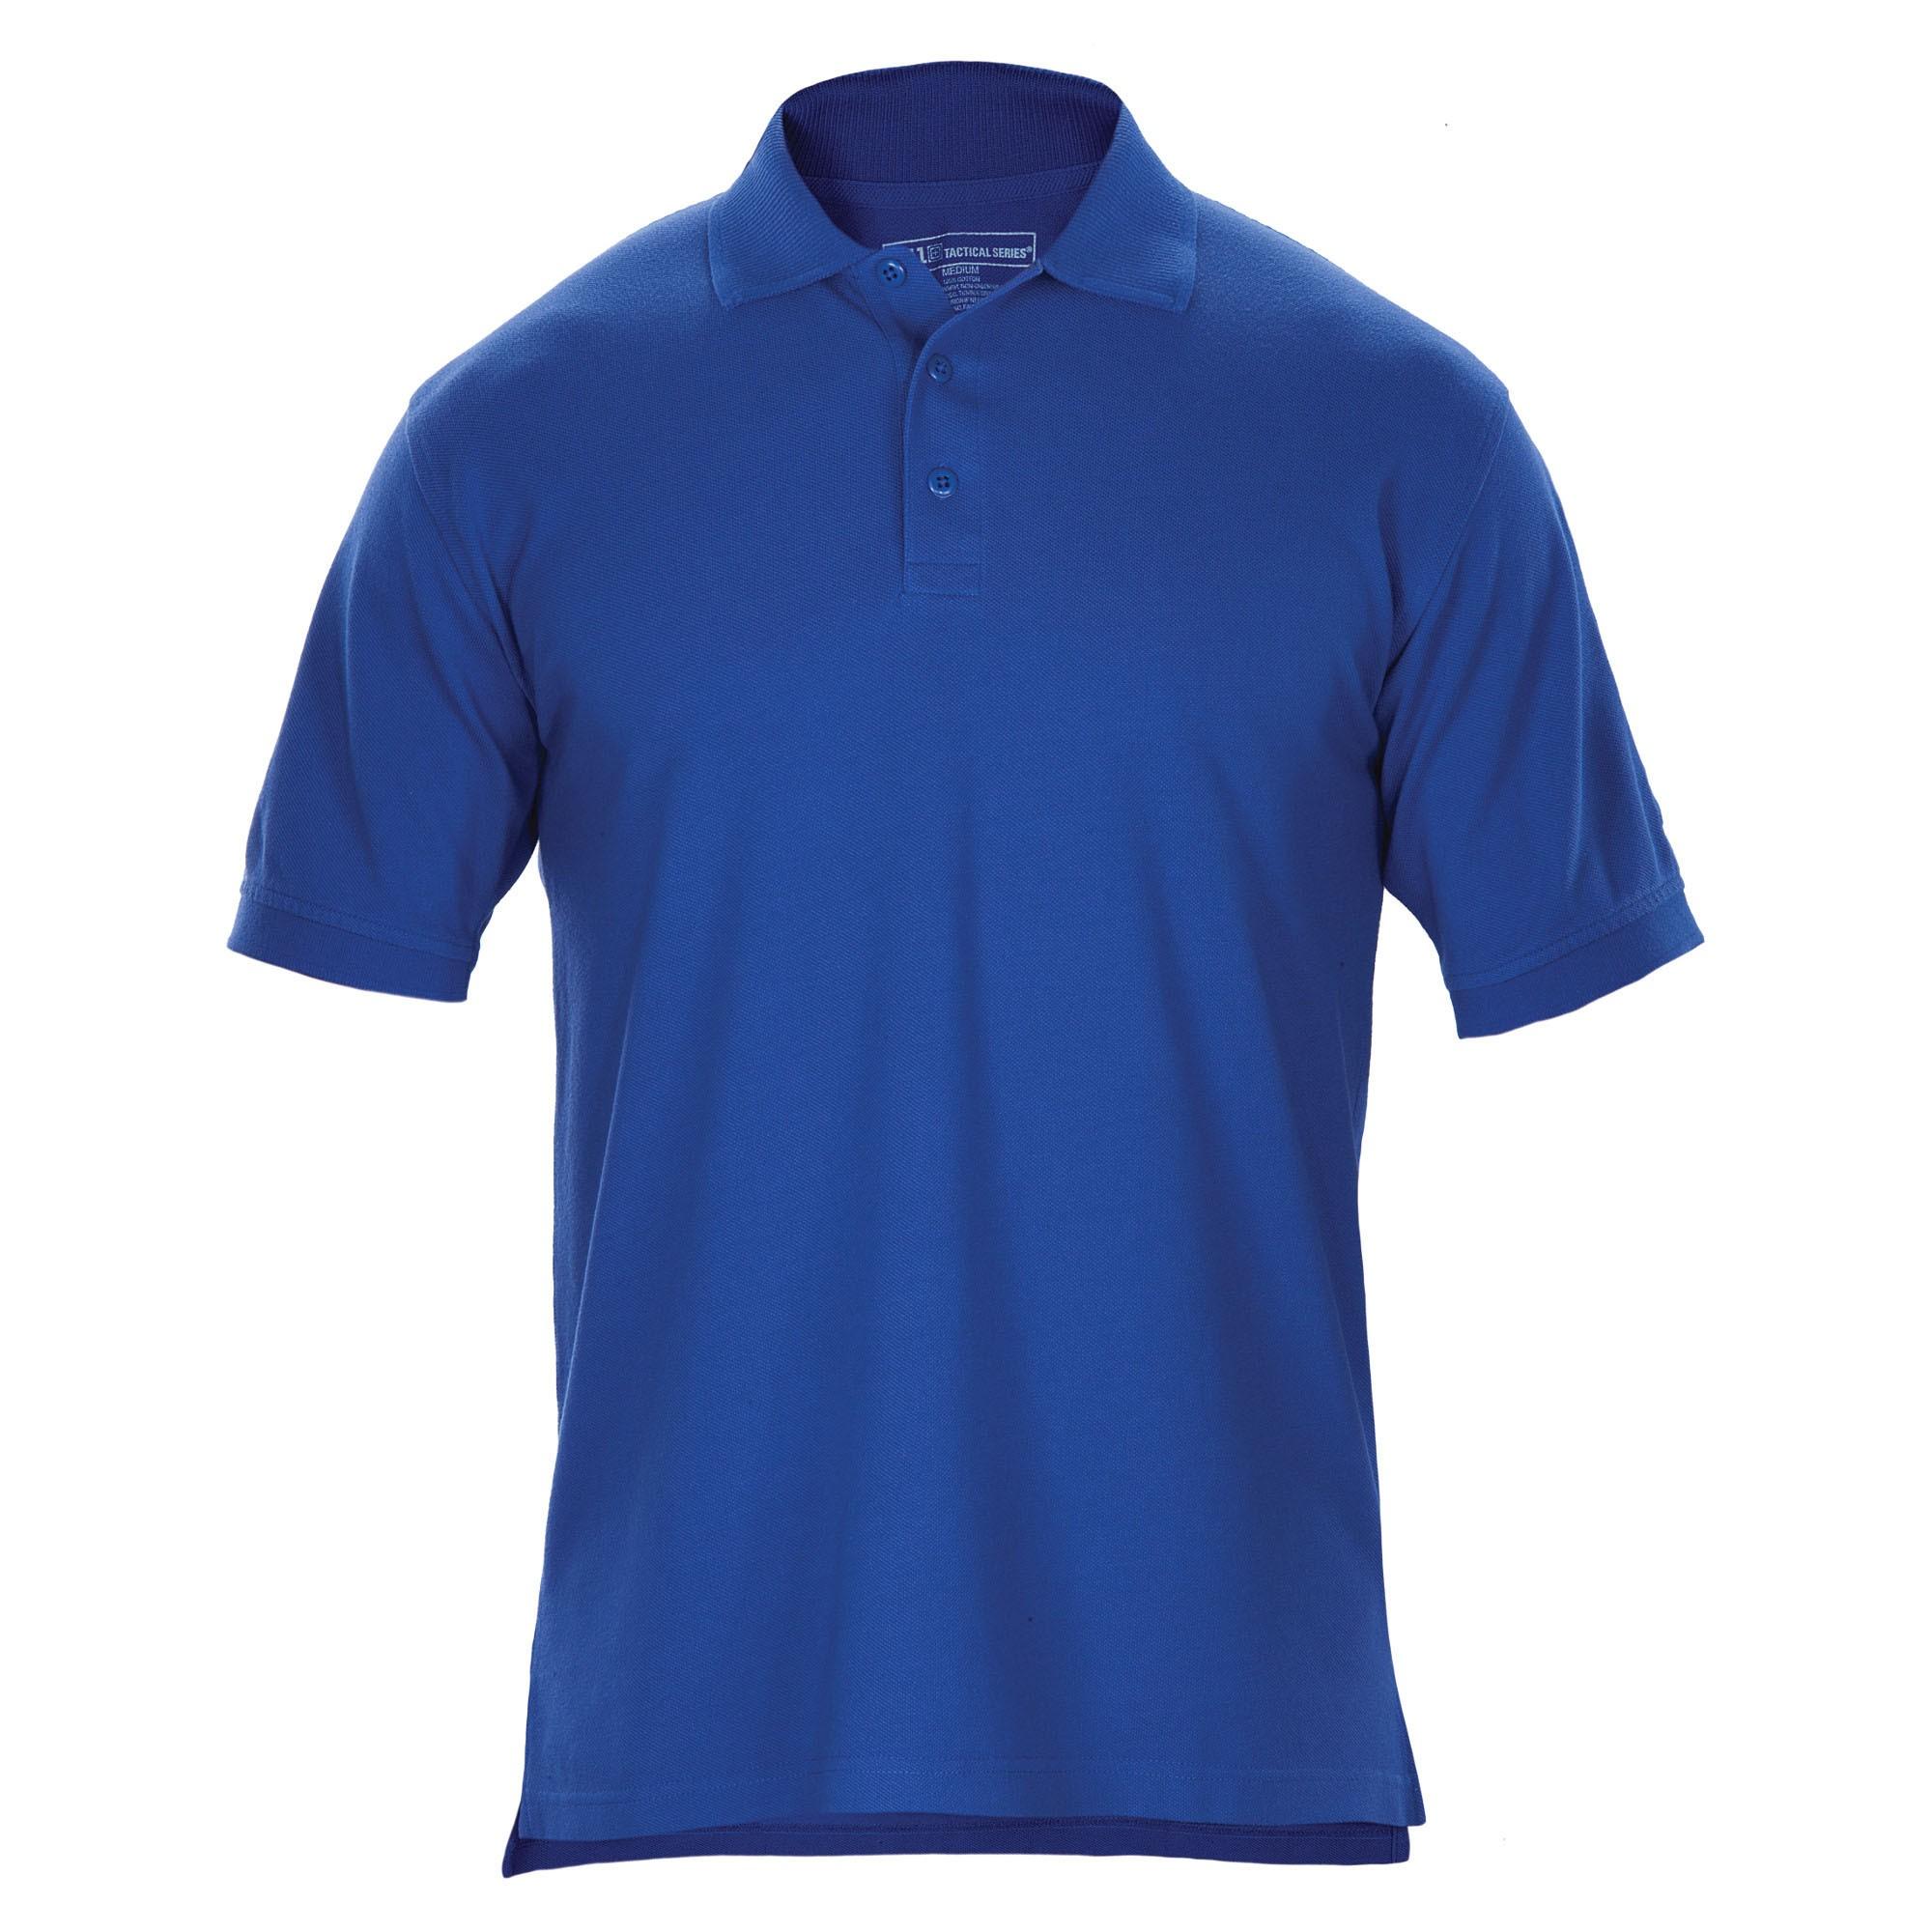 Men's 5.11 Tactical Professional Polo Shirt - 5.11 Tactical -